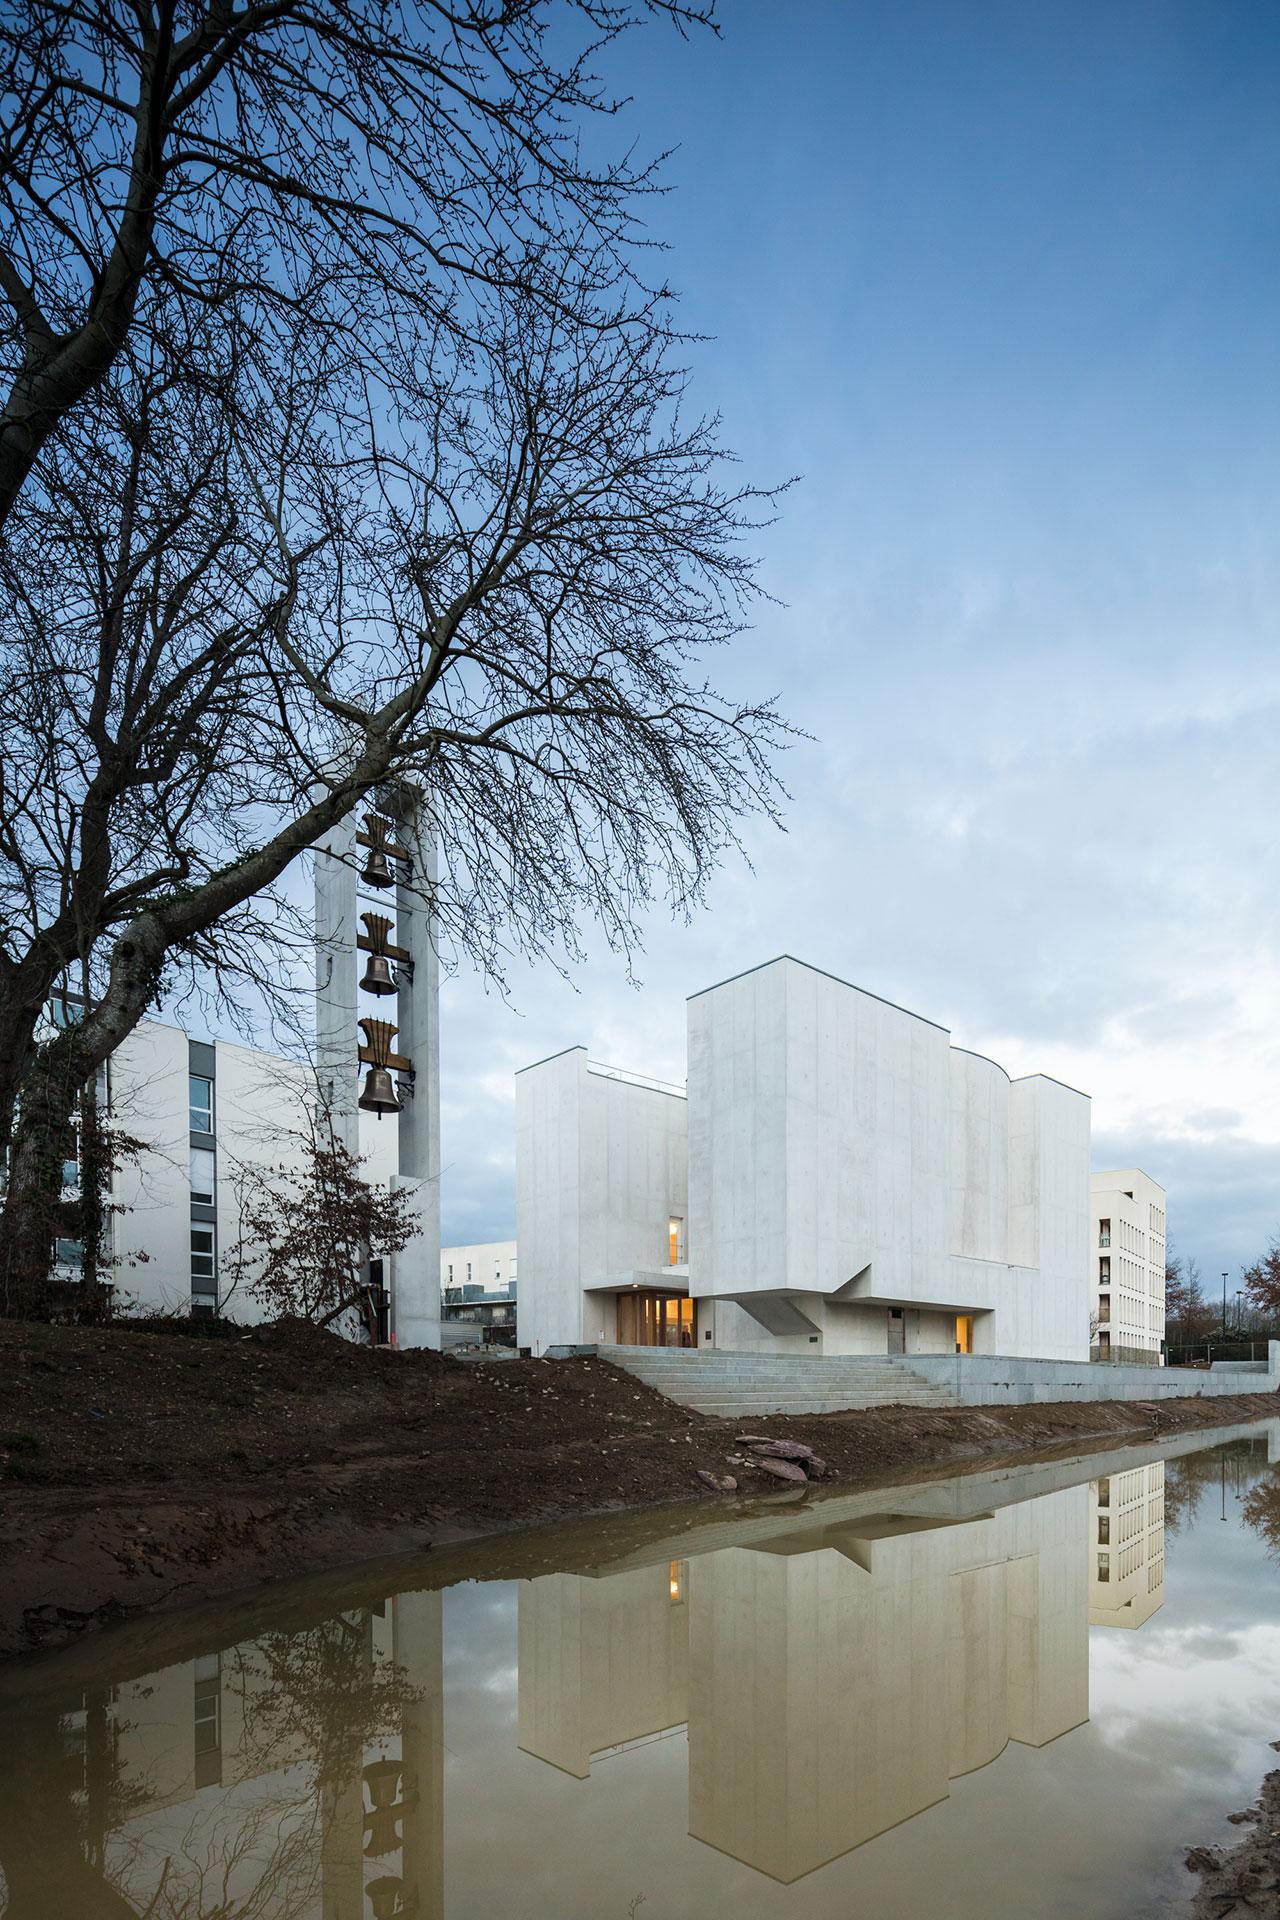 church of saint jacques de la lande a sculptural composition of white concrete and filtered. Black Bedroom Furniture Sets. Home Design Ideas